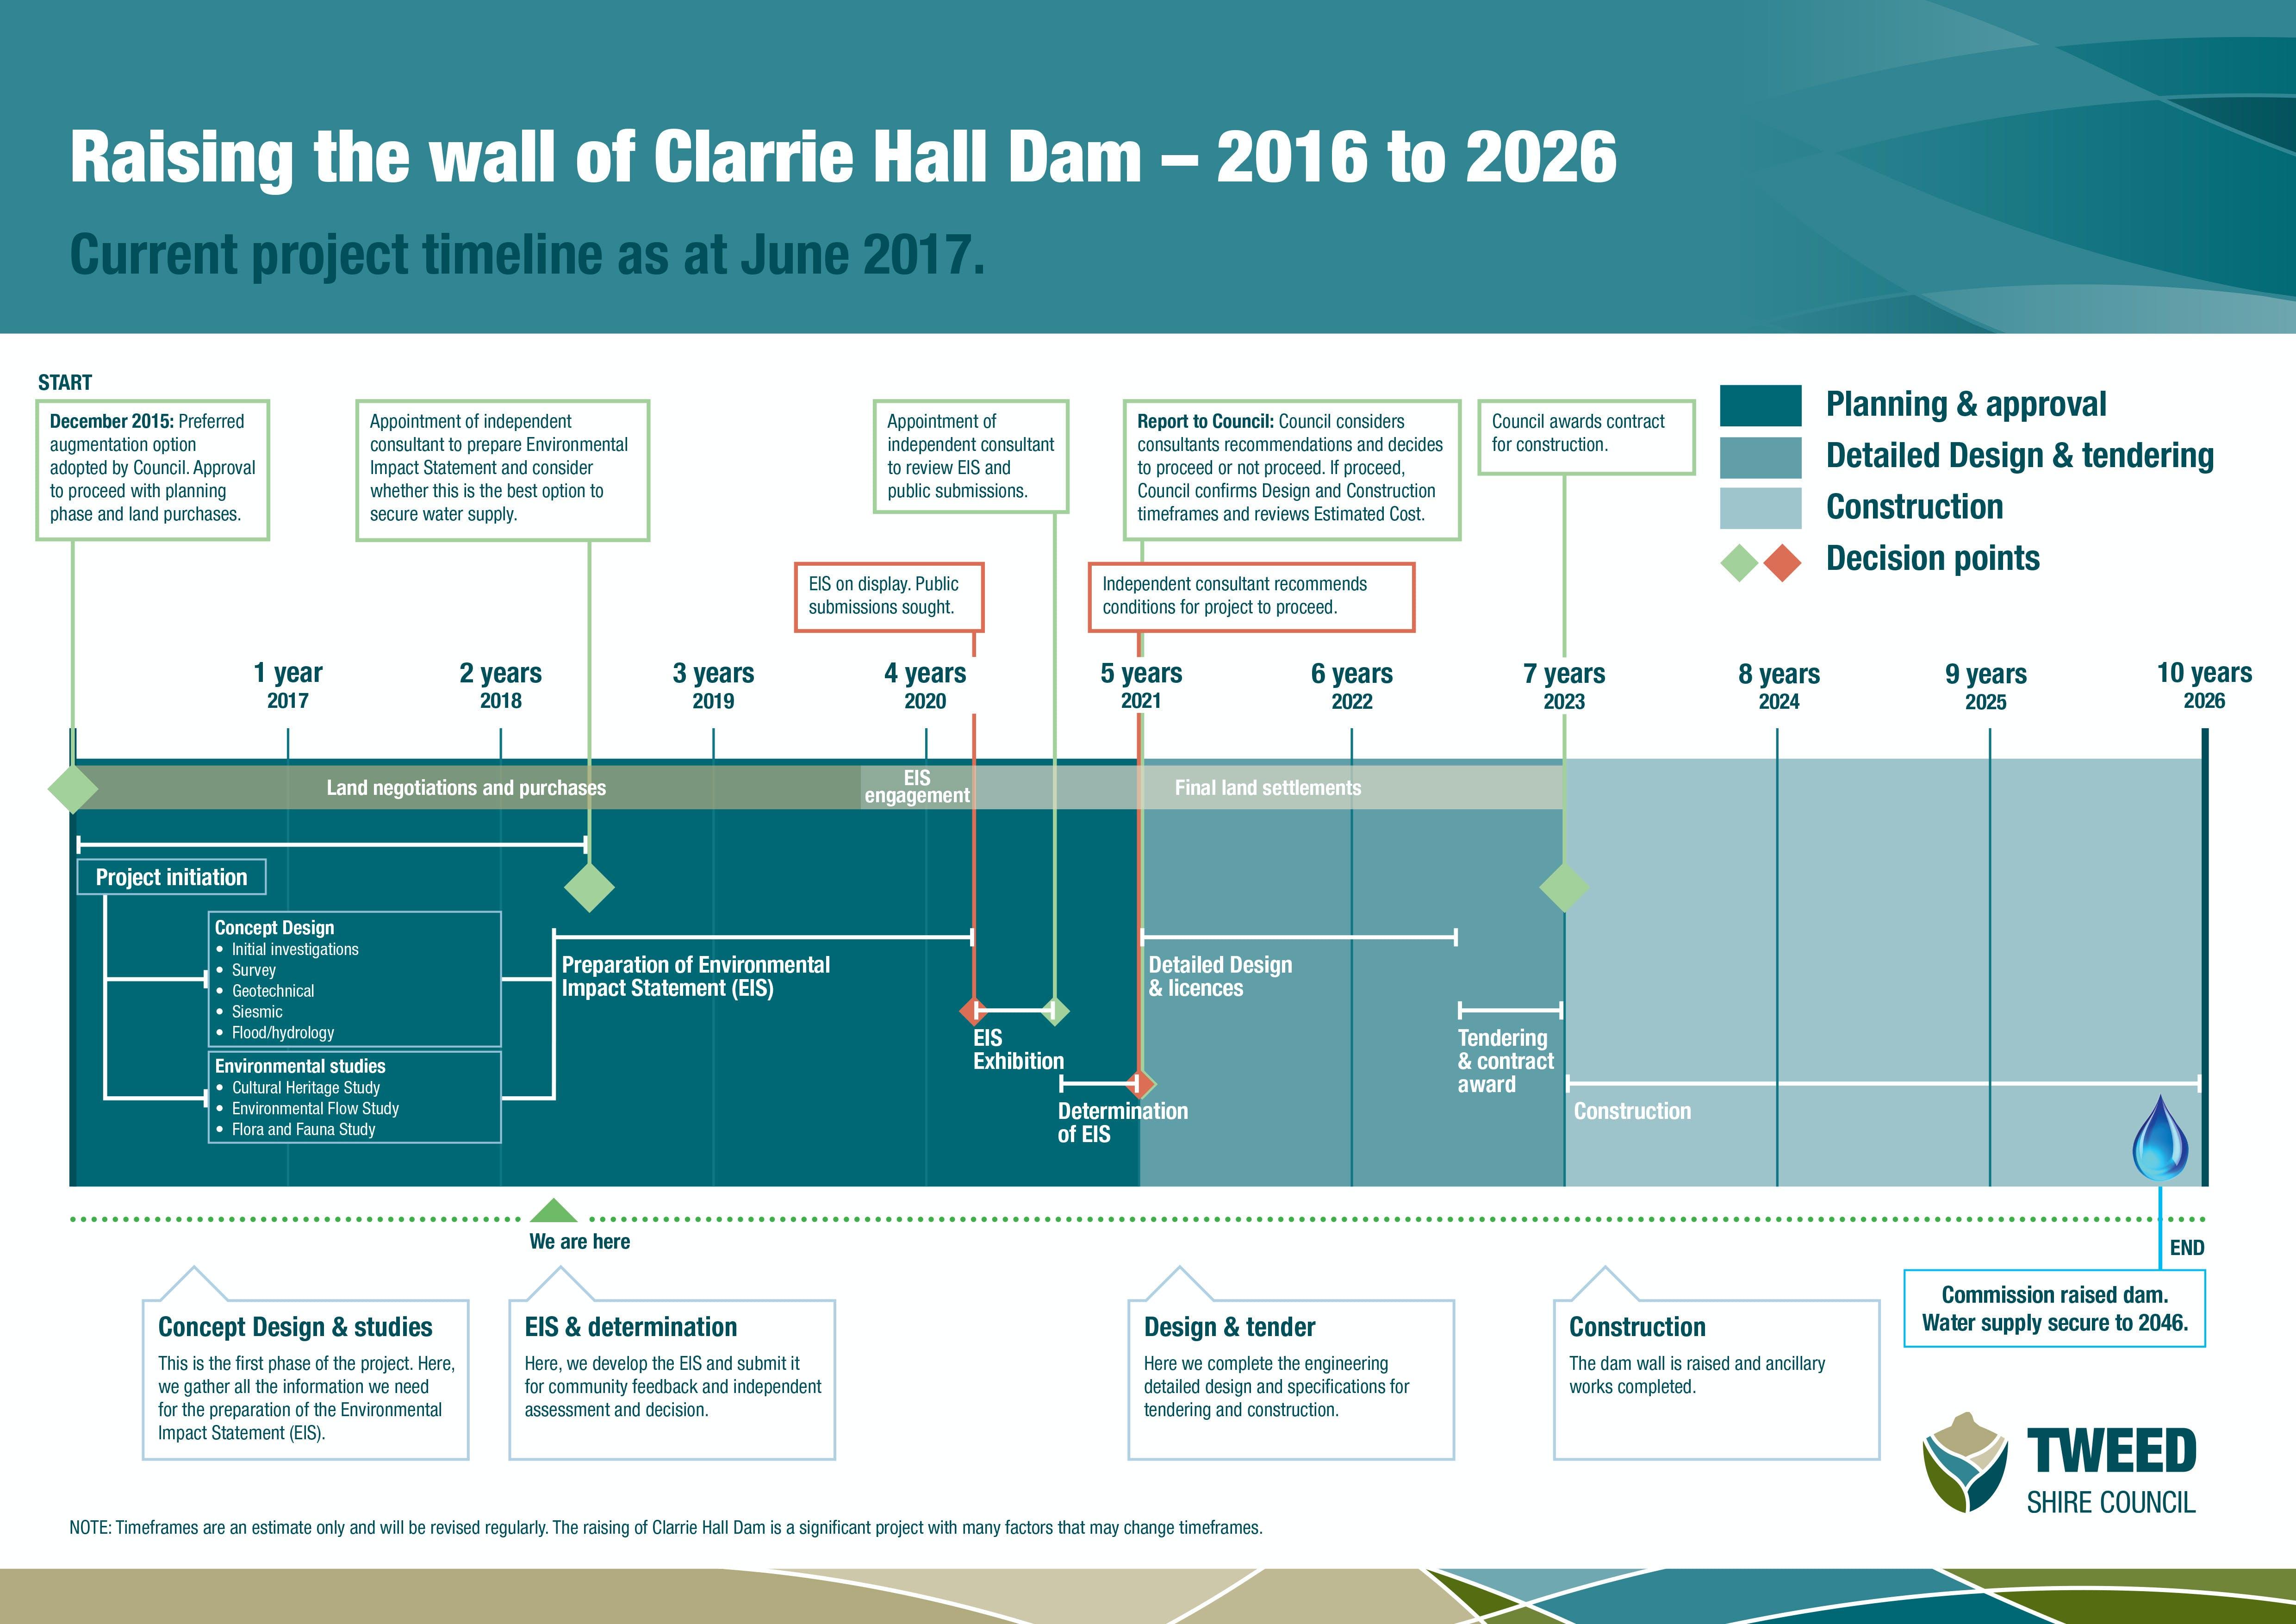 0103 Ch Timeline 2016 2026 Update